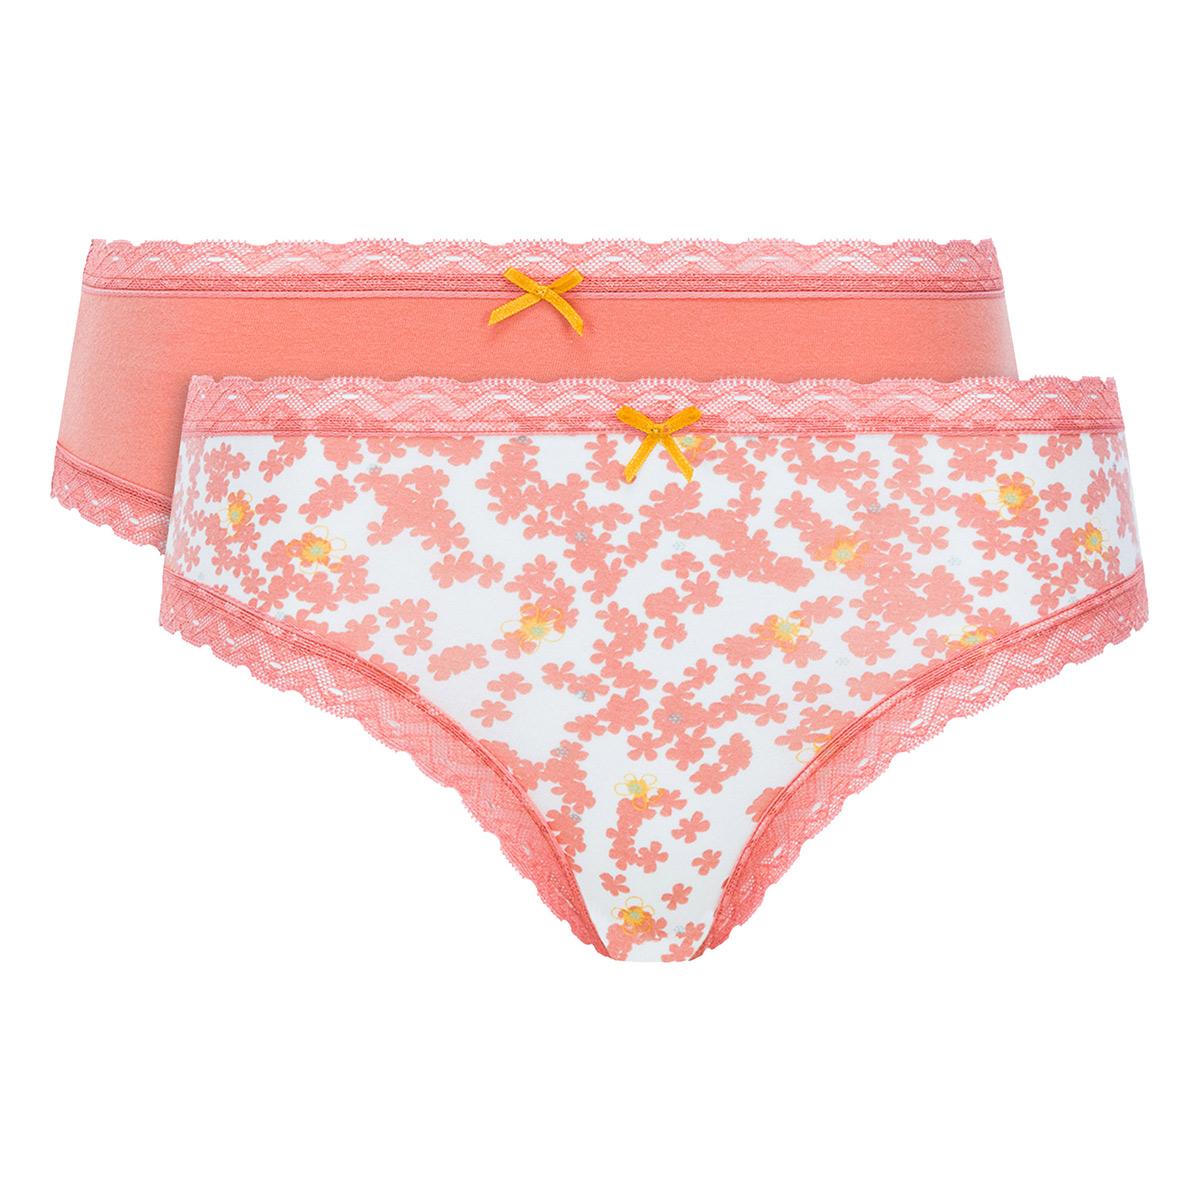 Pack of 2 Bikini Knickers in Orange Print - Cotton Fancy - PLAYTEX